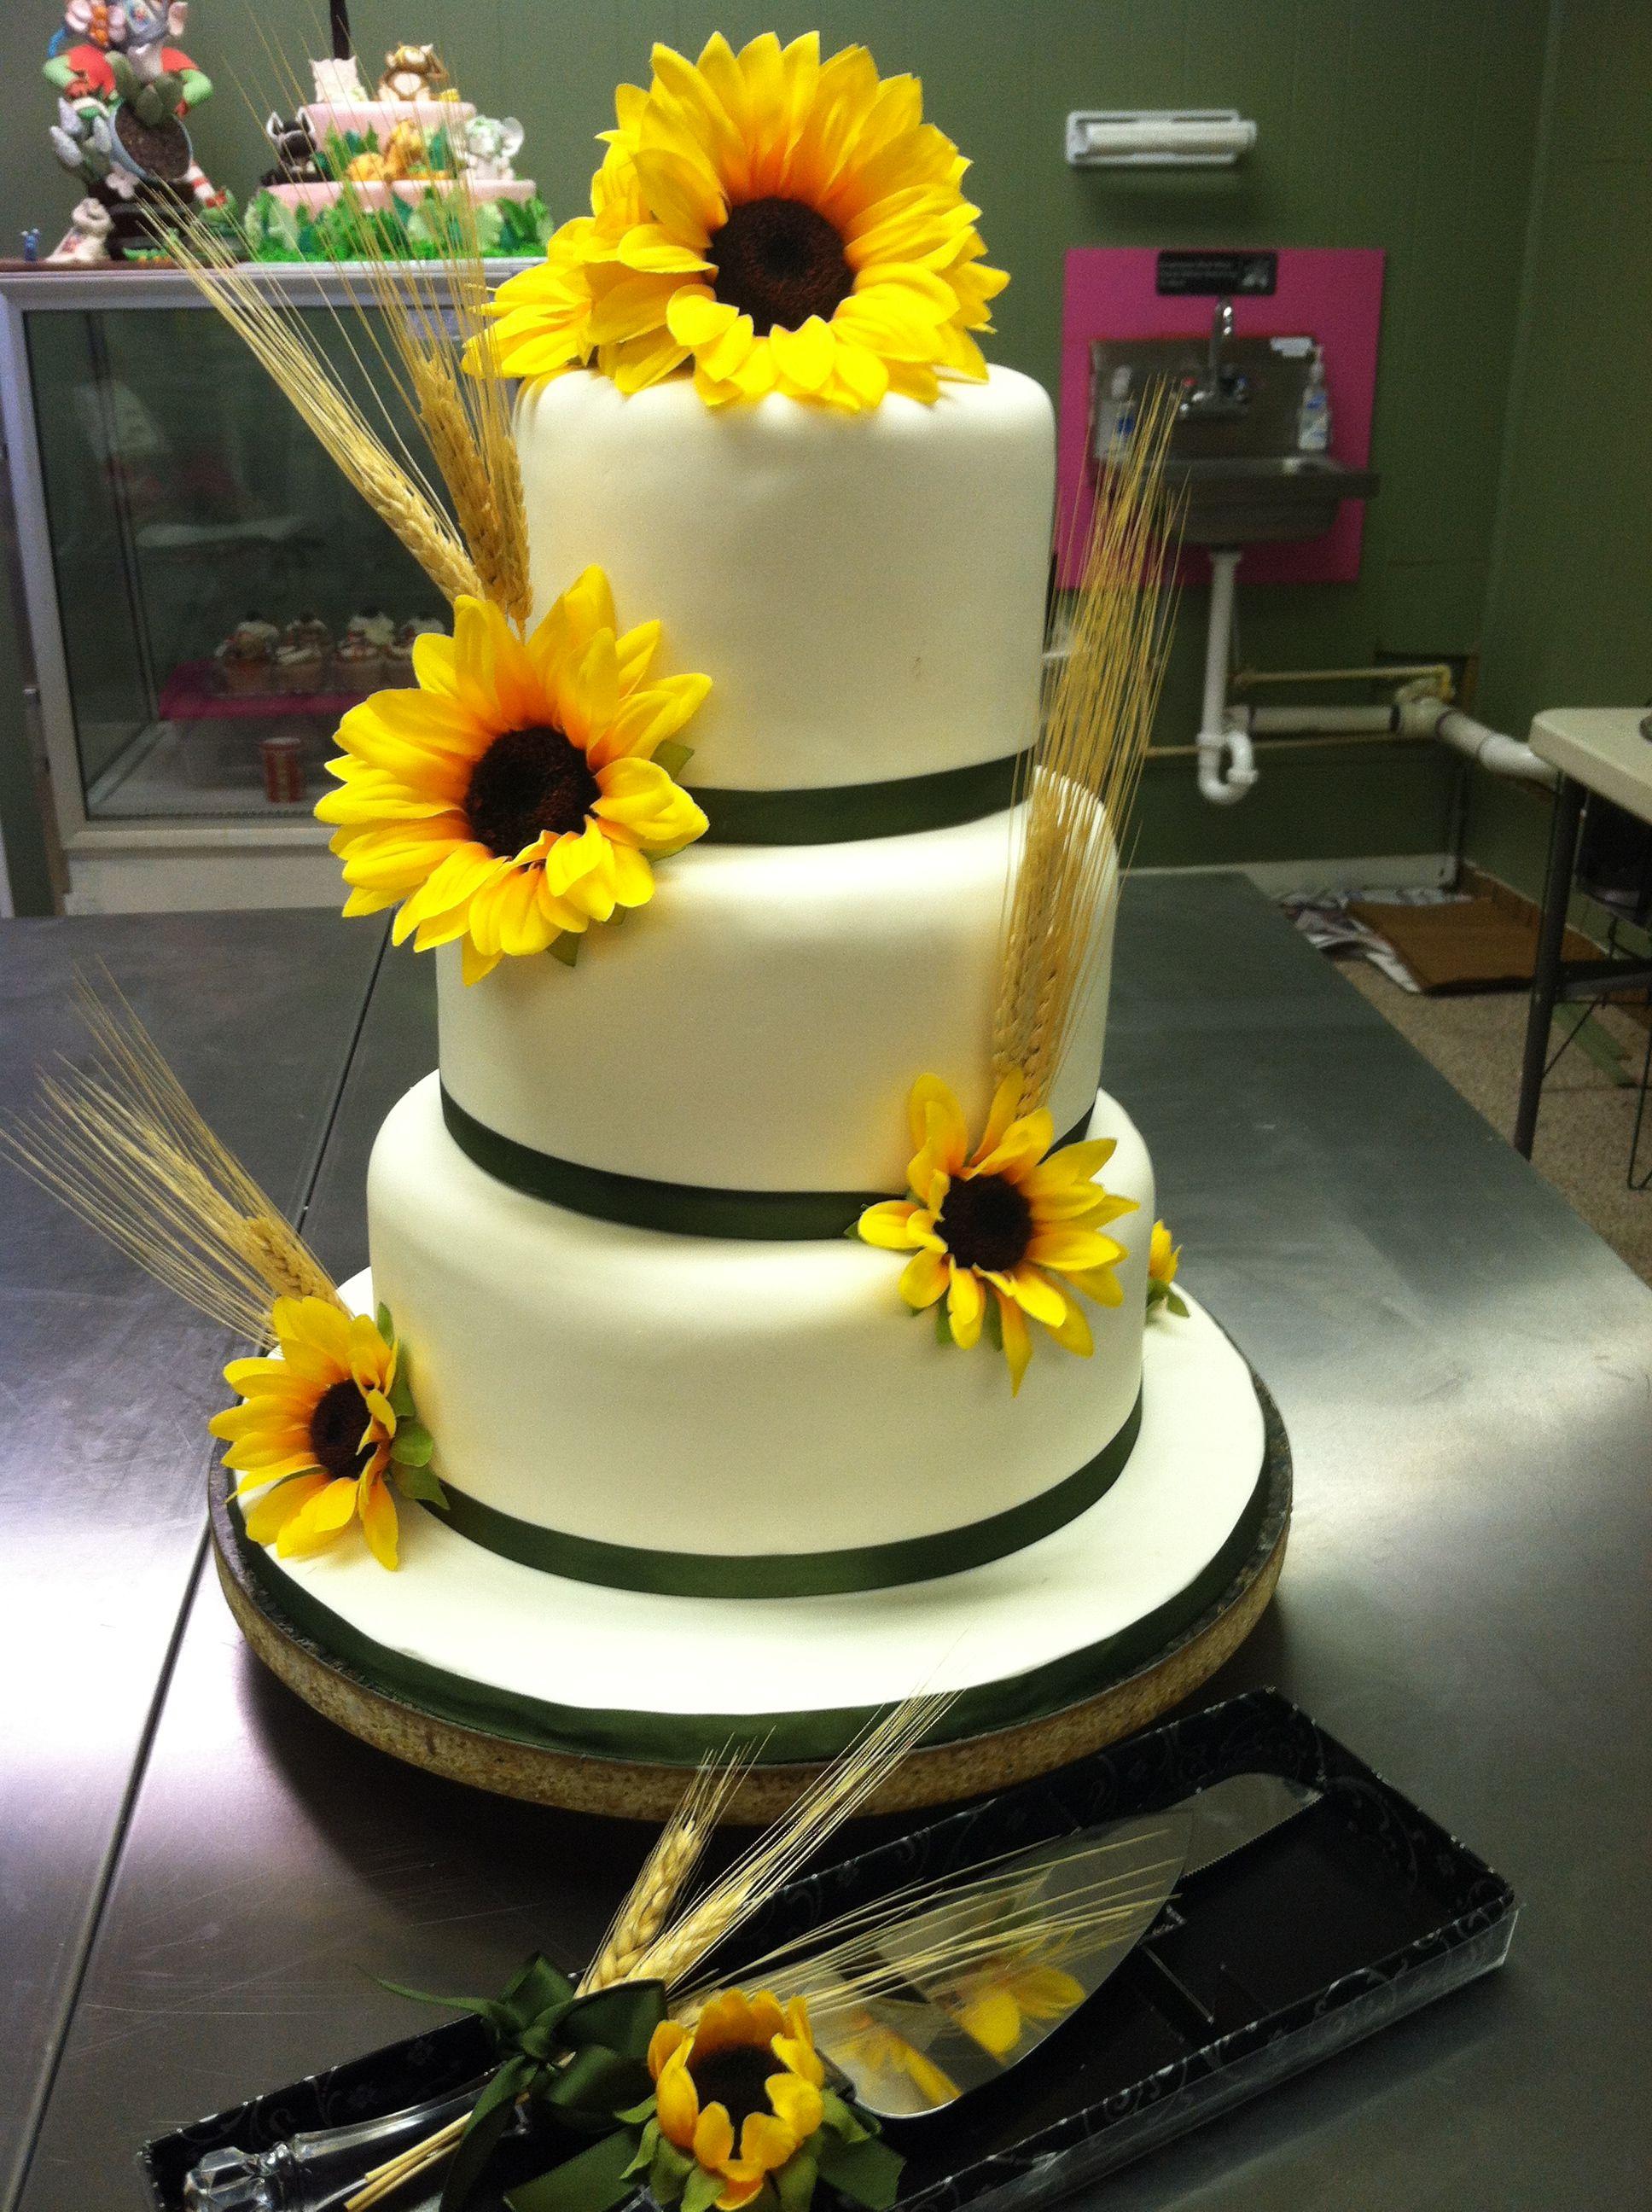 Sunflower wedding cake Sunflower wedding cake, Sunflower